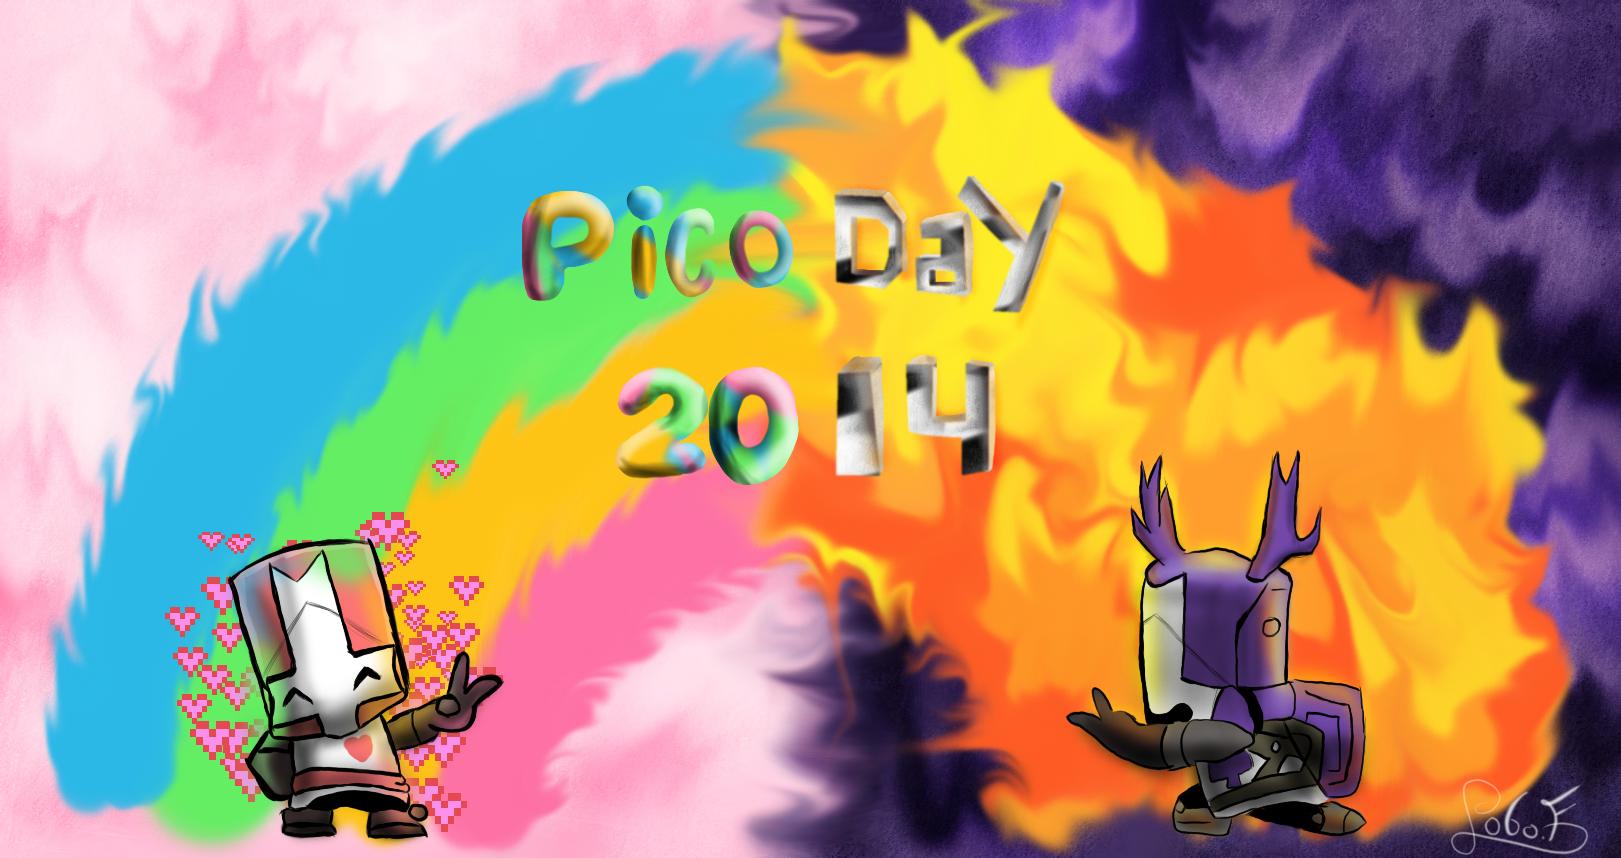 PicoDay 2014